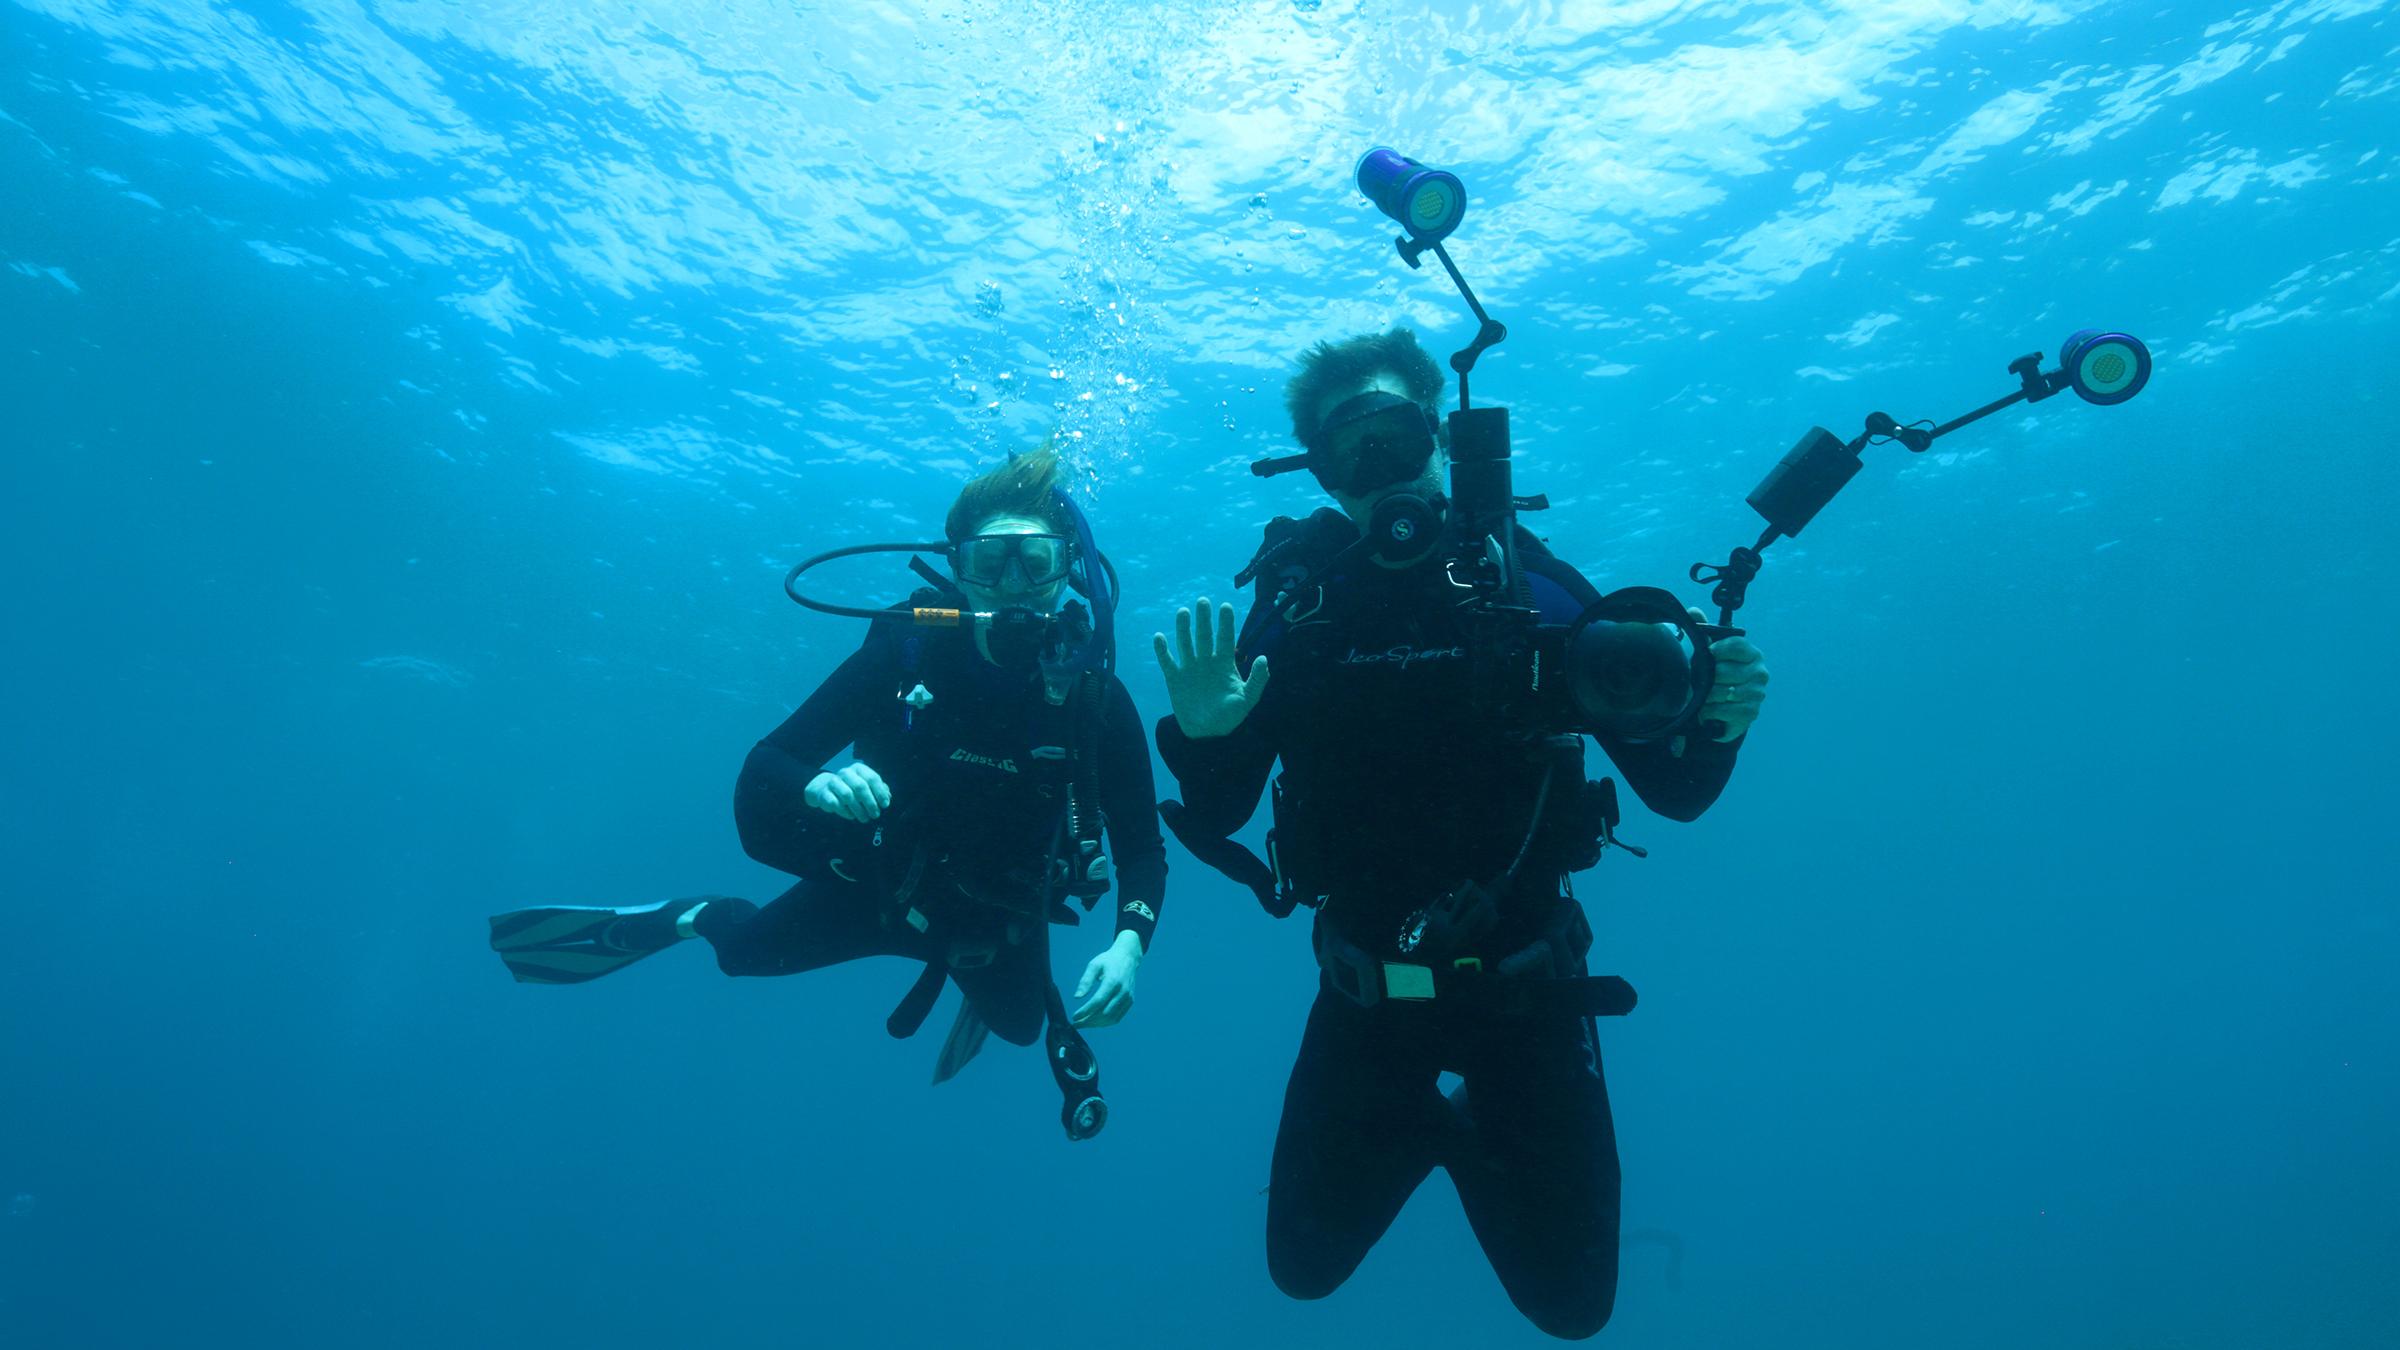 Laura Sams and Robert Sams scuba dive with their video camera.